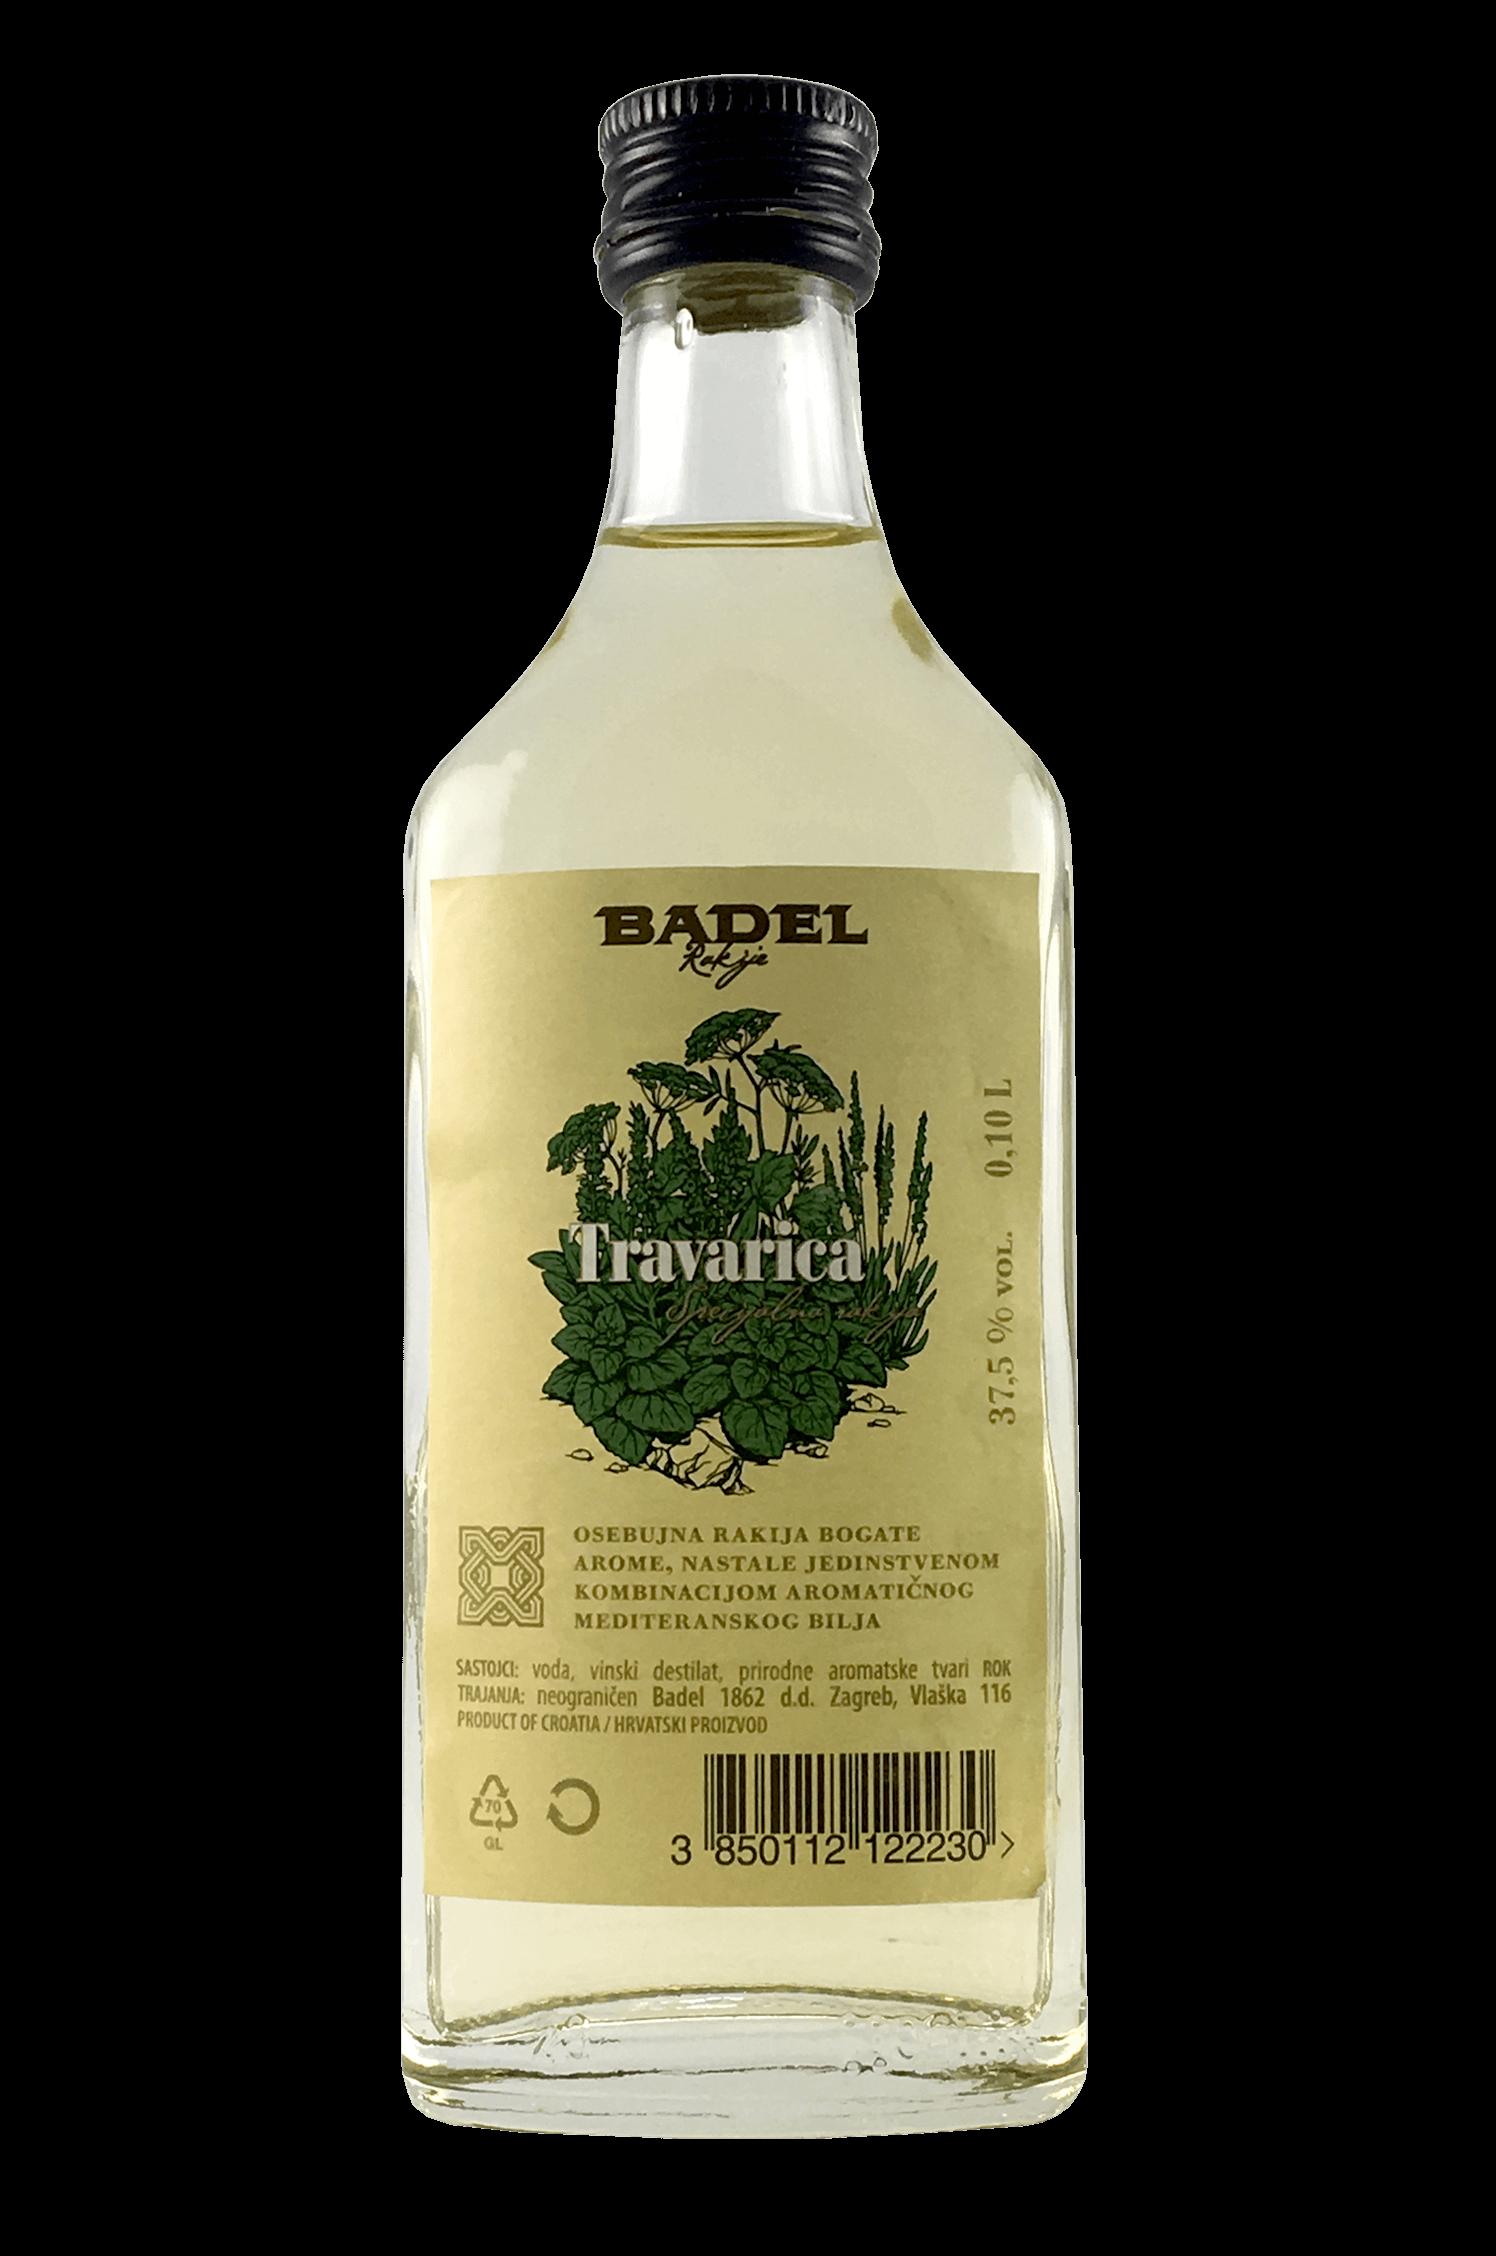 Badel Travarica